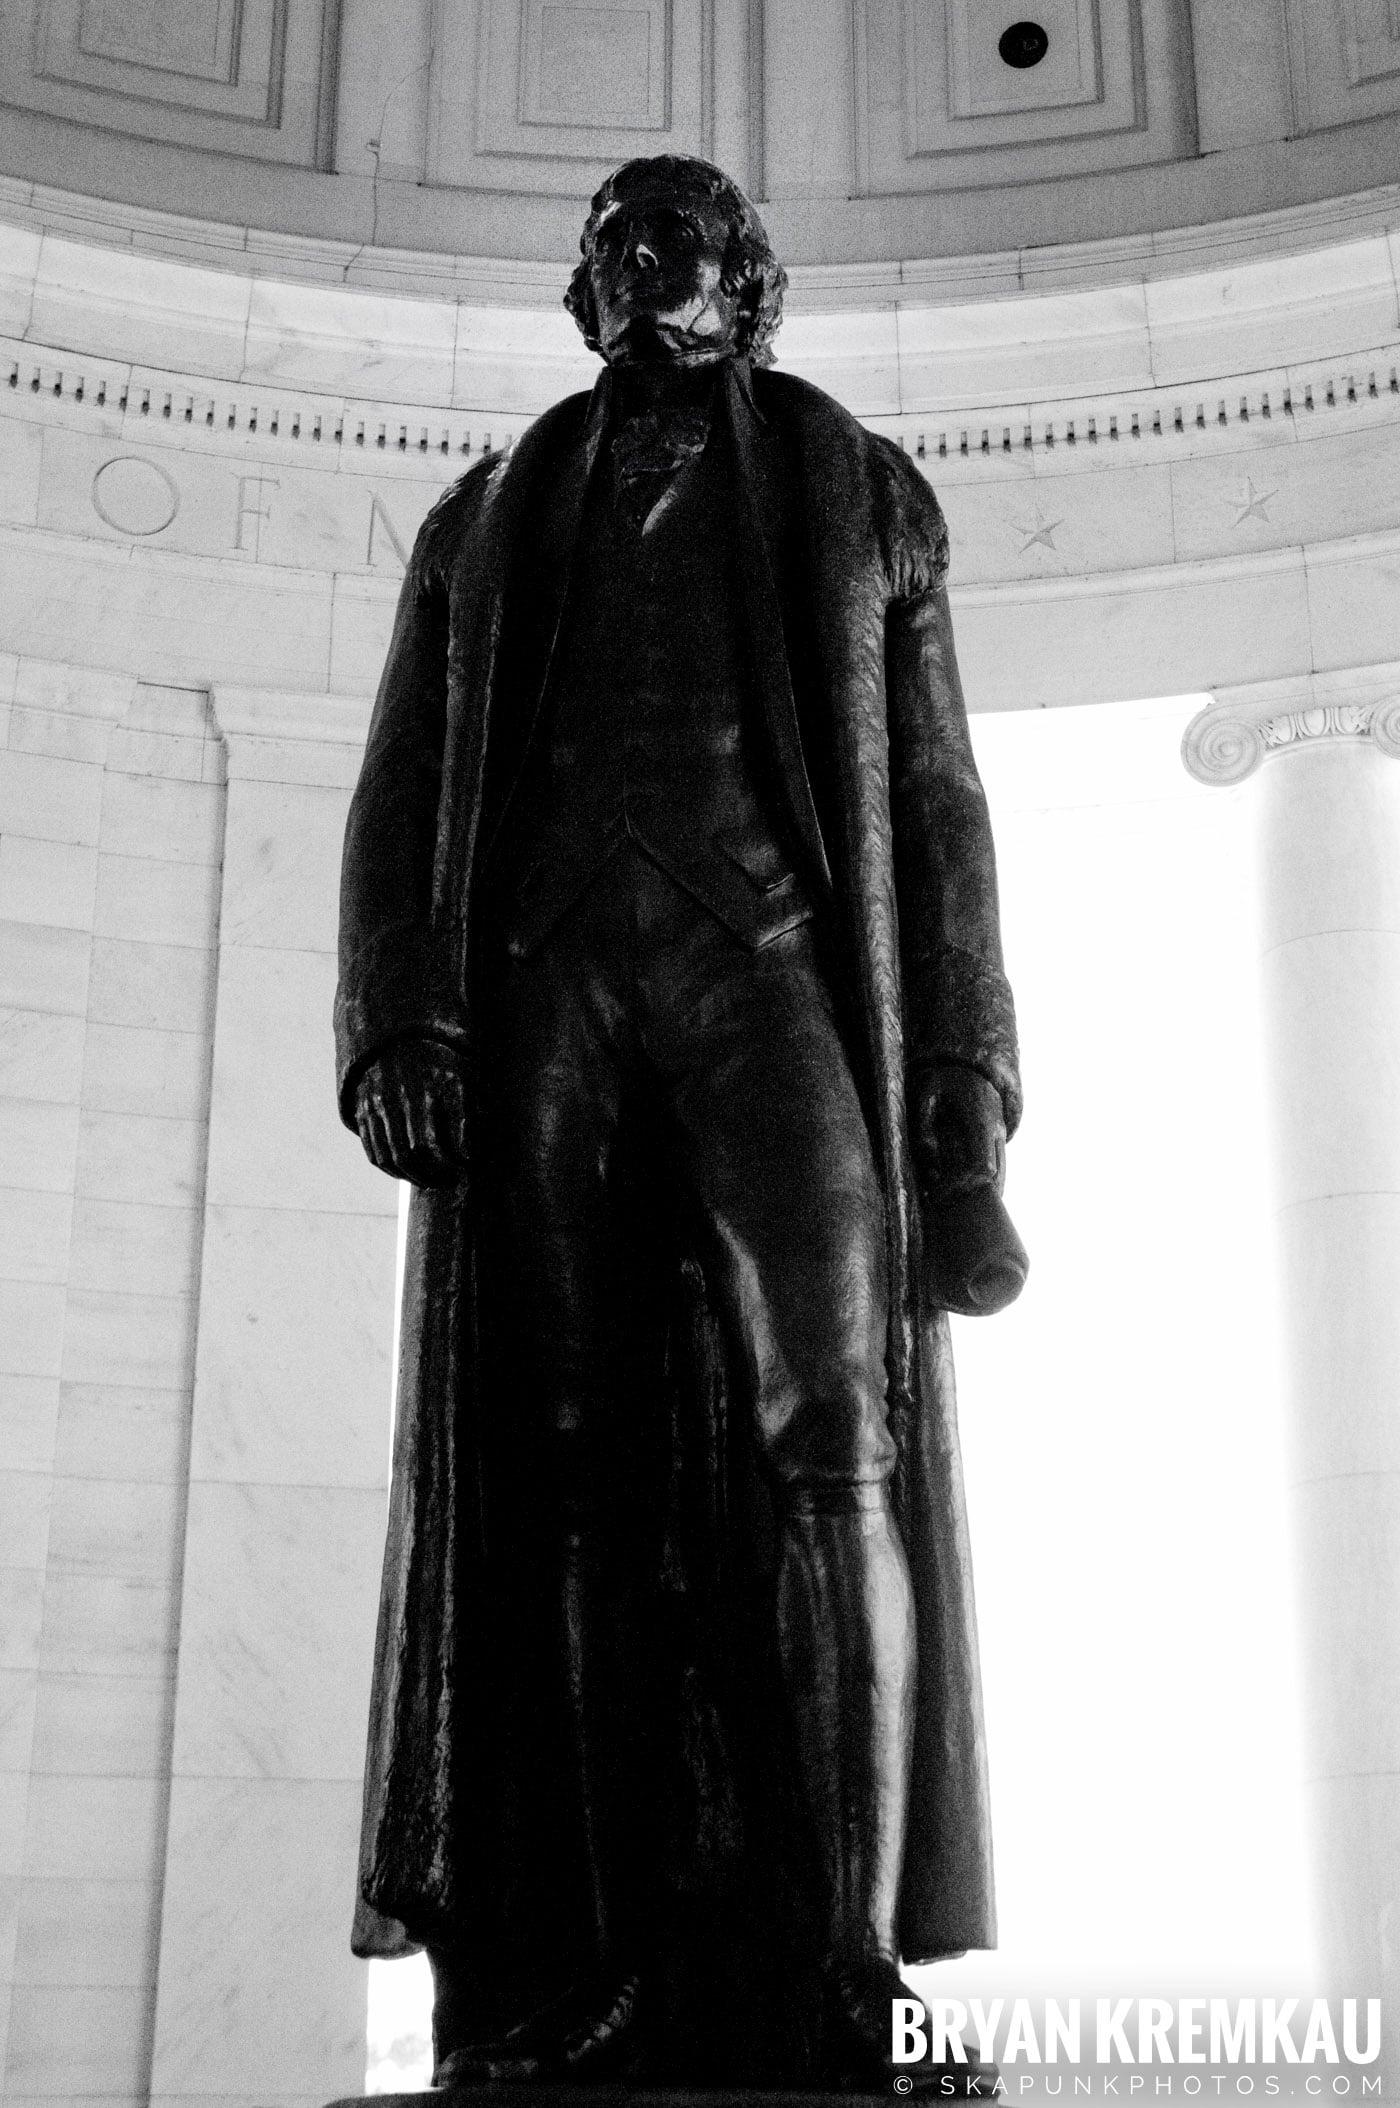 Washington, DC Trip - Day 3 - 4.10.10 (13)